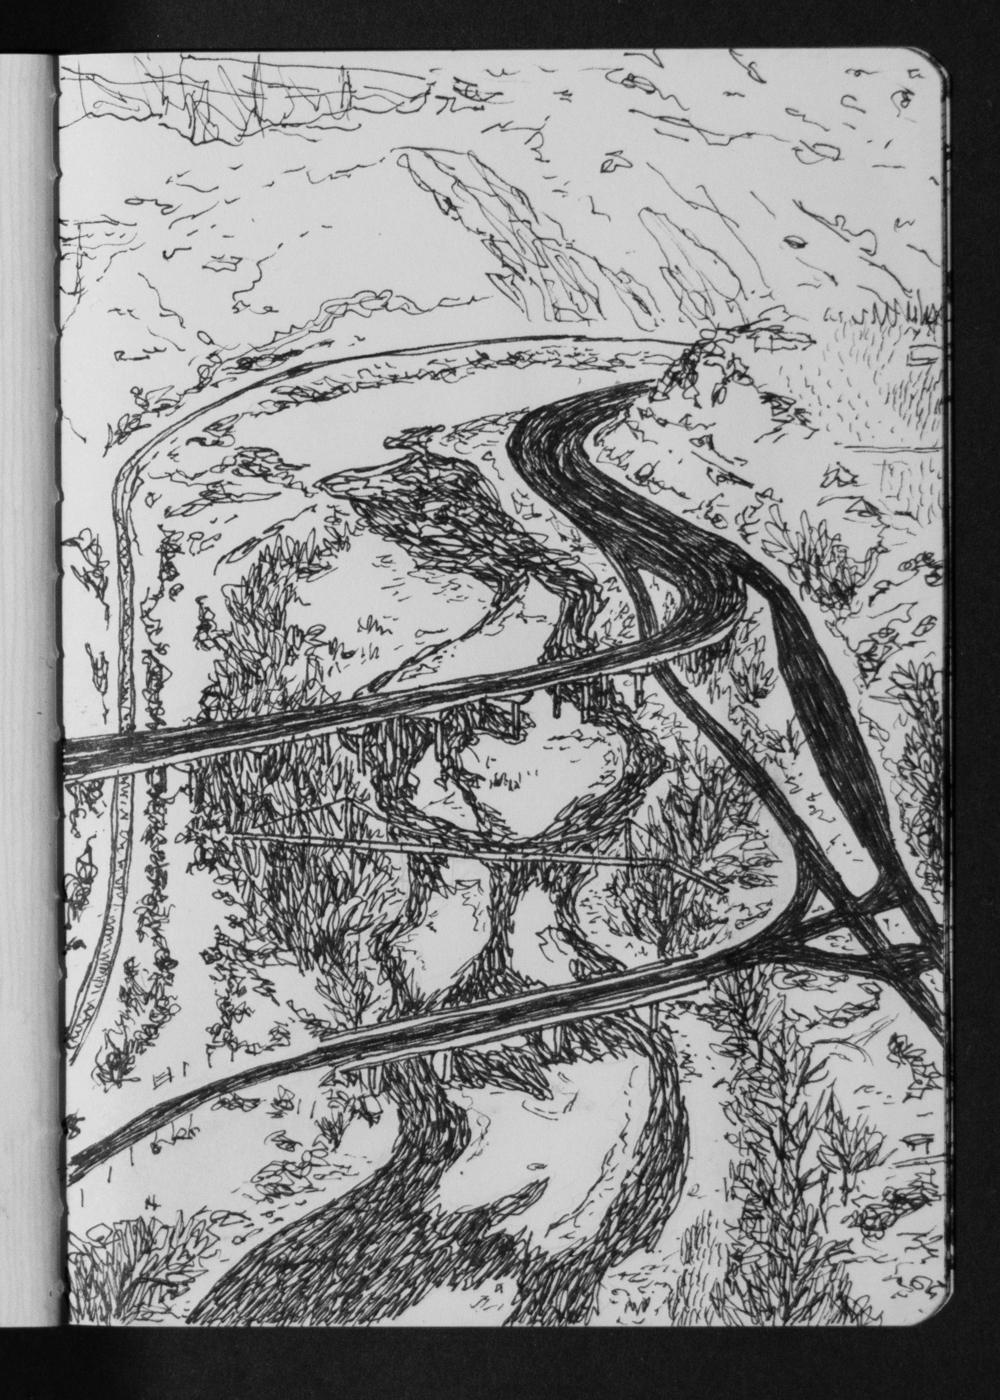 03-20 I70 Over the Colorado from Palisade Rim.jpg